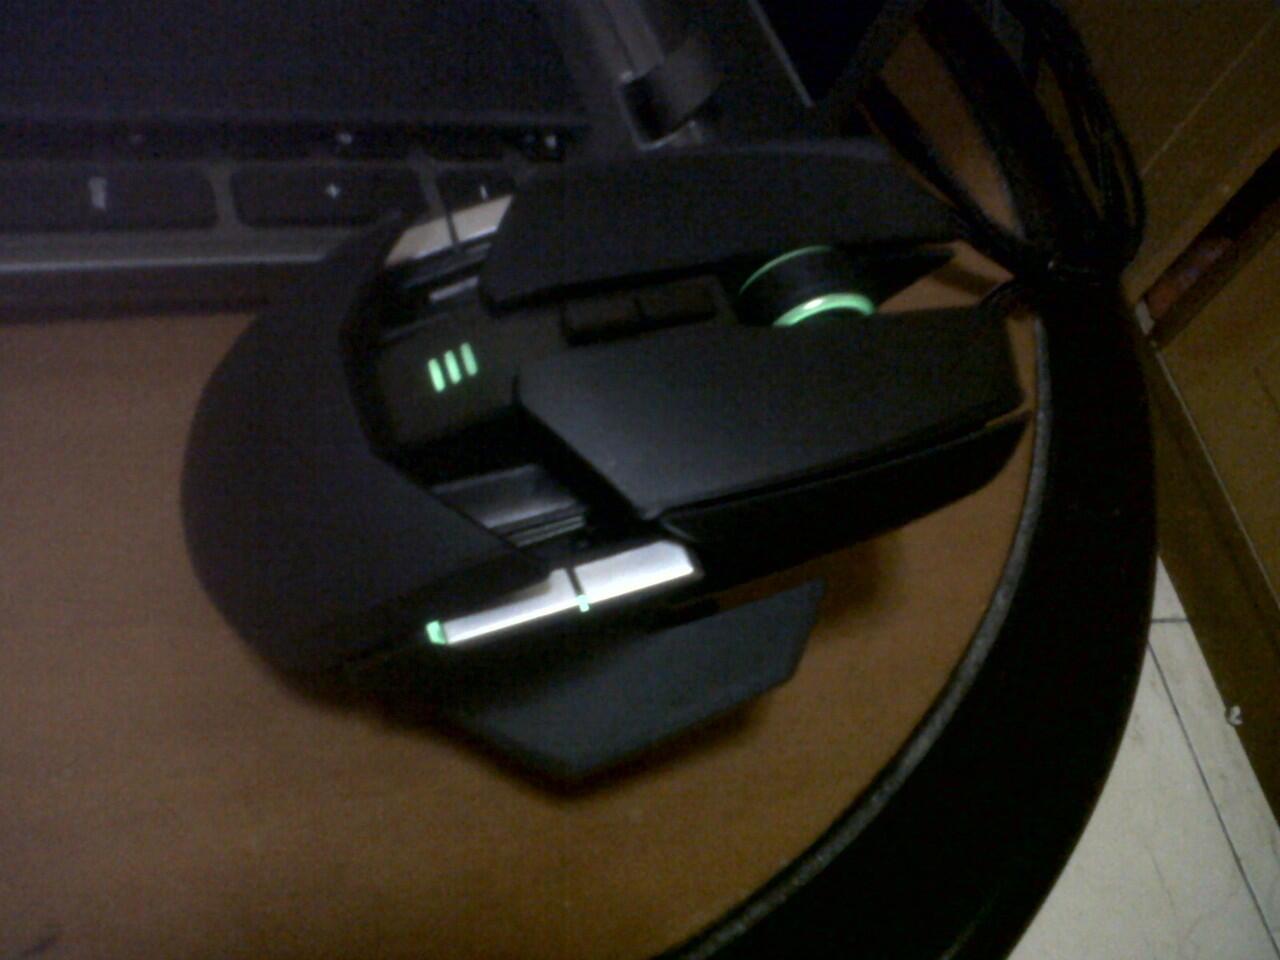 Jual Steelseries Qck Dex Mini Mass Fnatic Navi Dota 2 Mlg Tyloo Black W 250 X L 210 H 2mm Mousepad Gaming